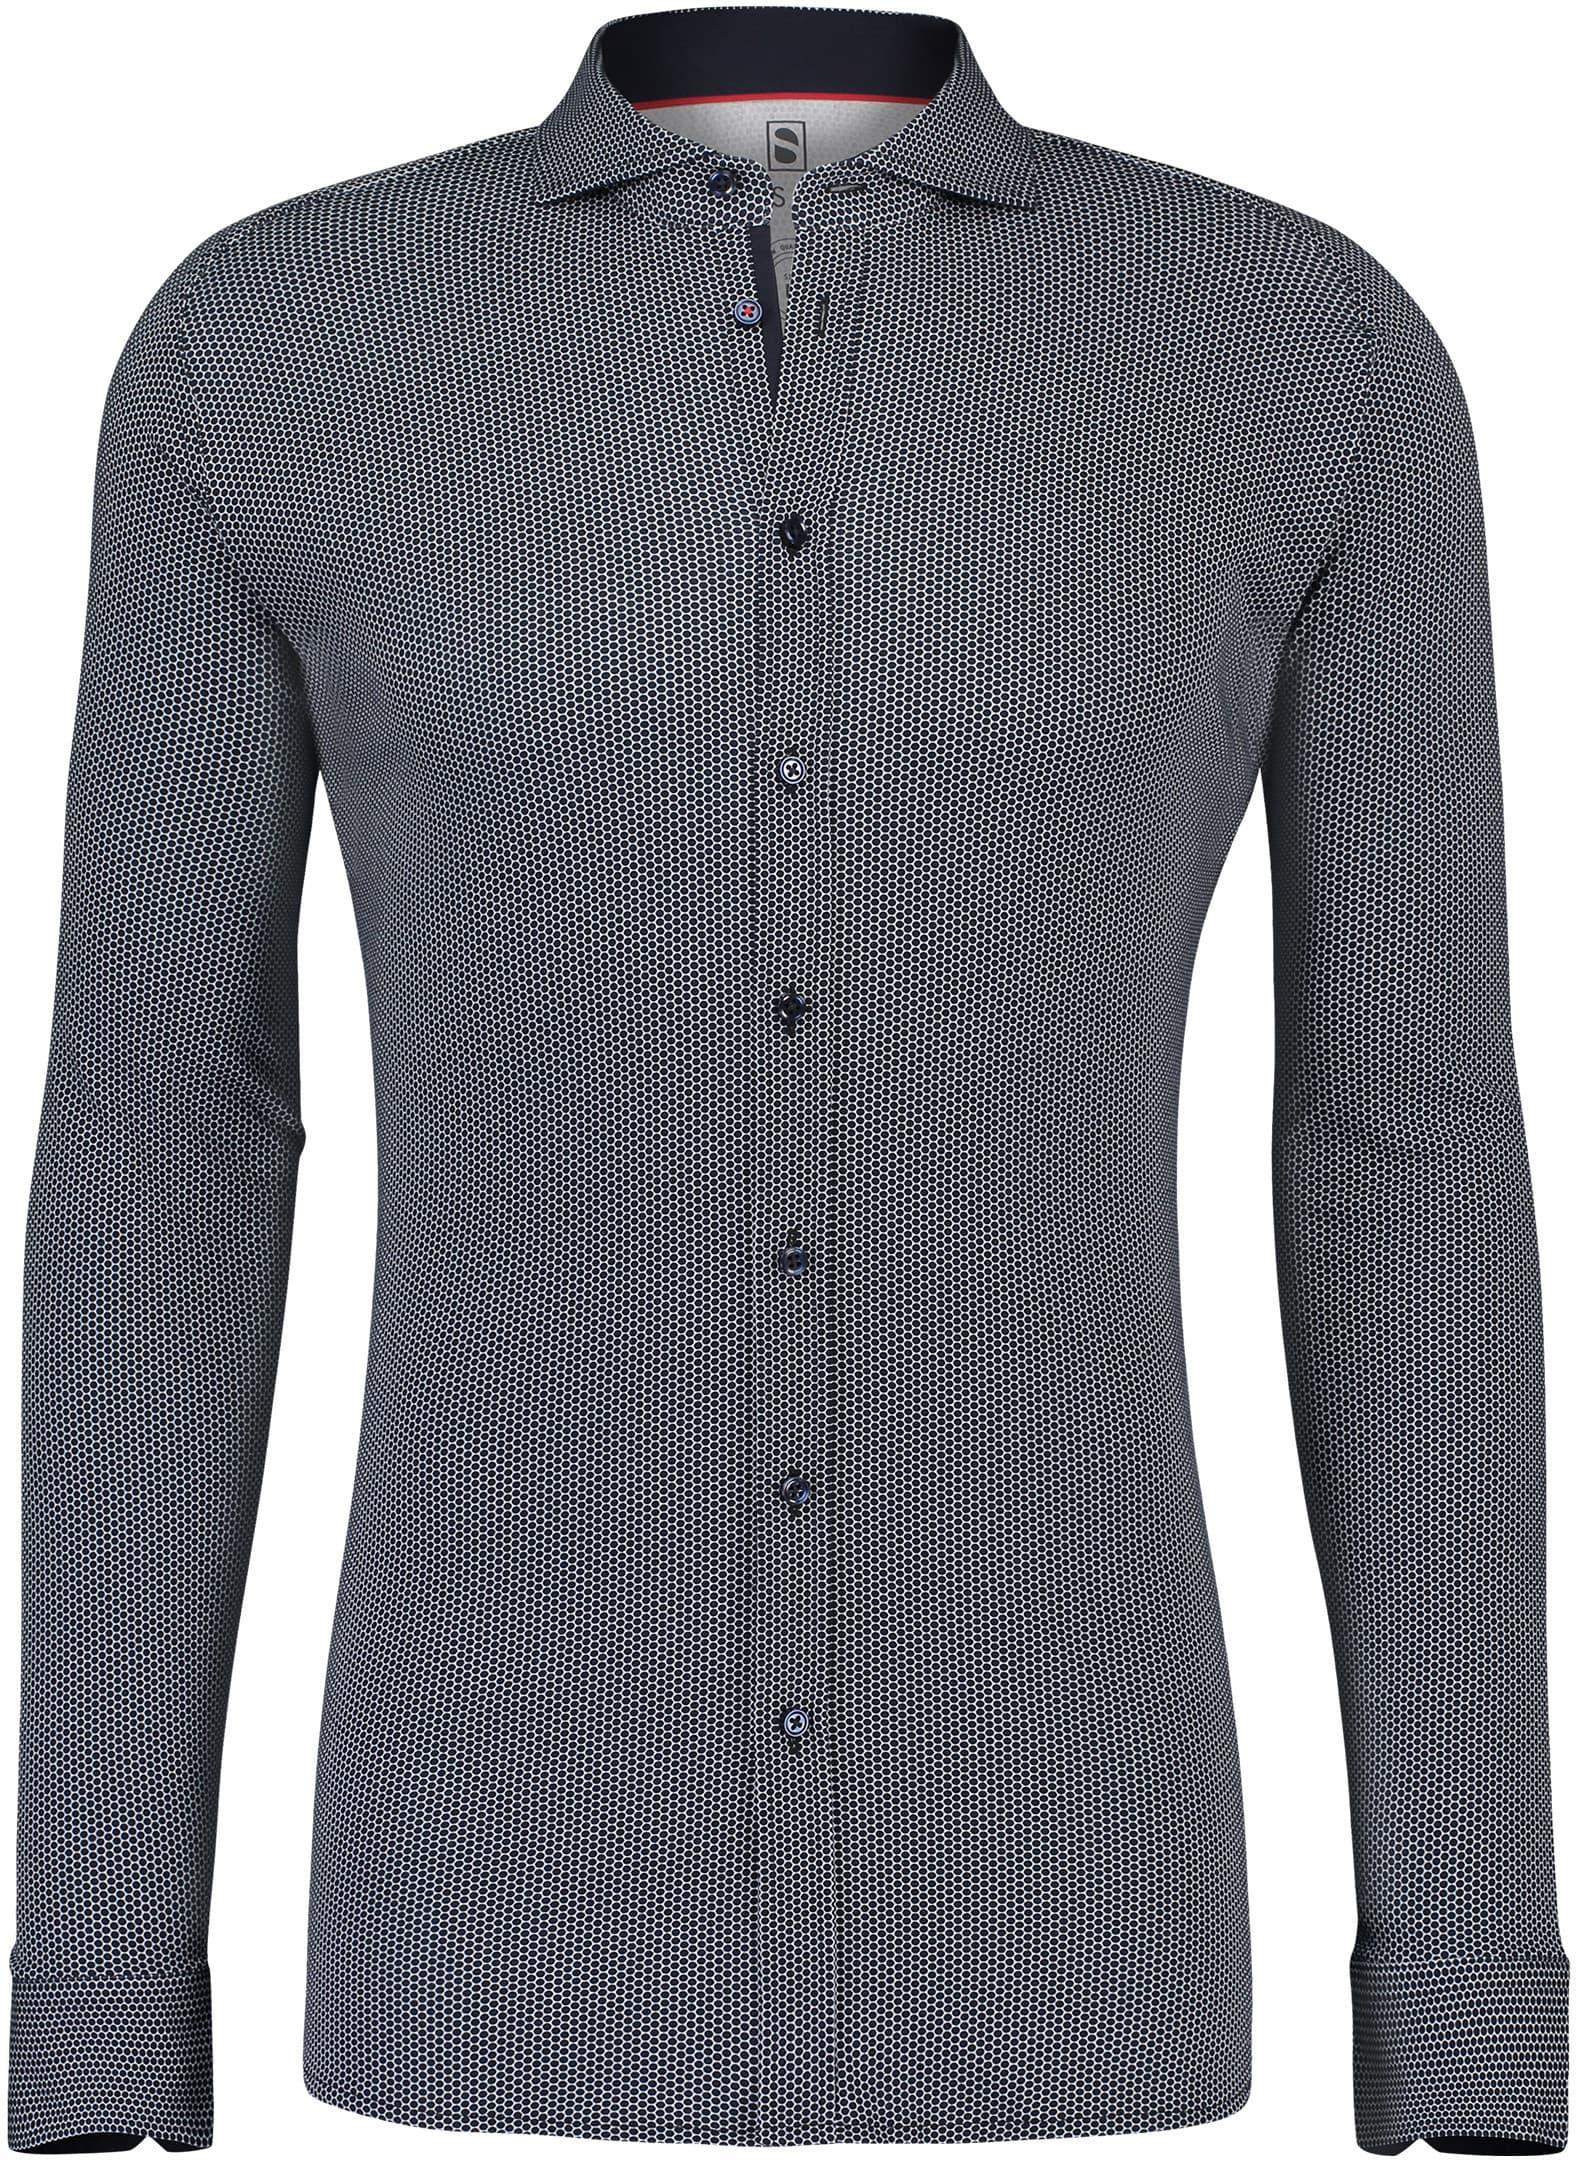 Desoto Overhemd Strijkvrij Stippen Donkerblauw foto 0